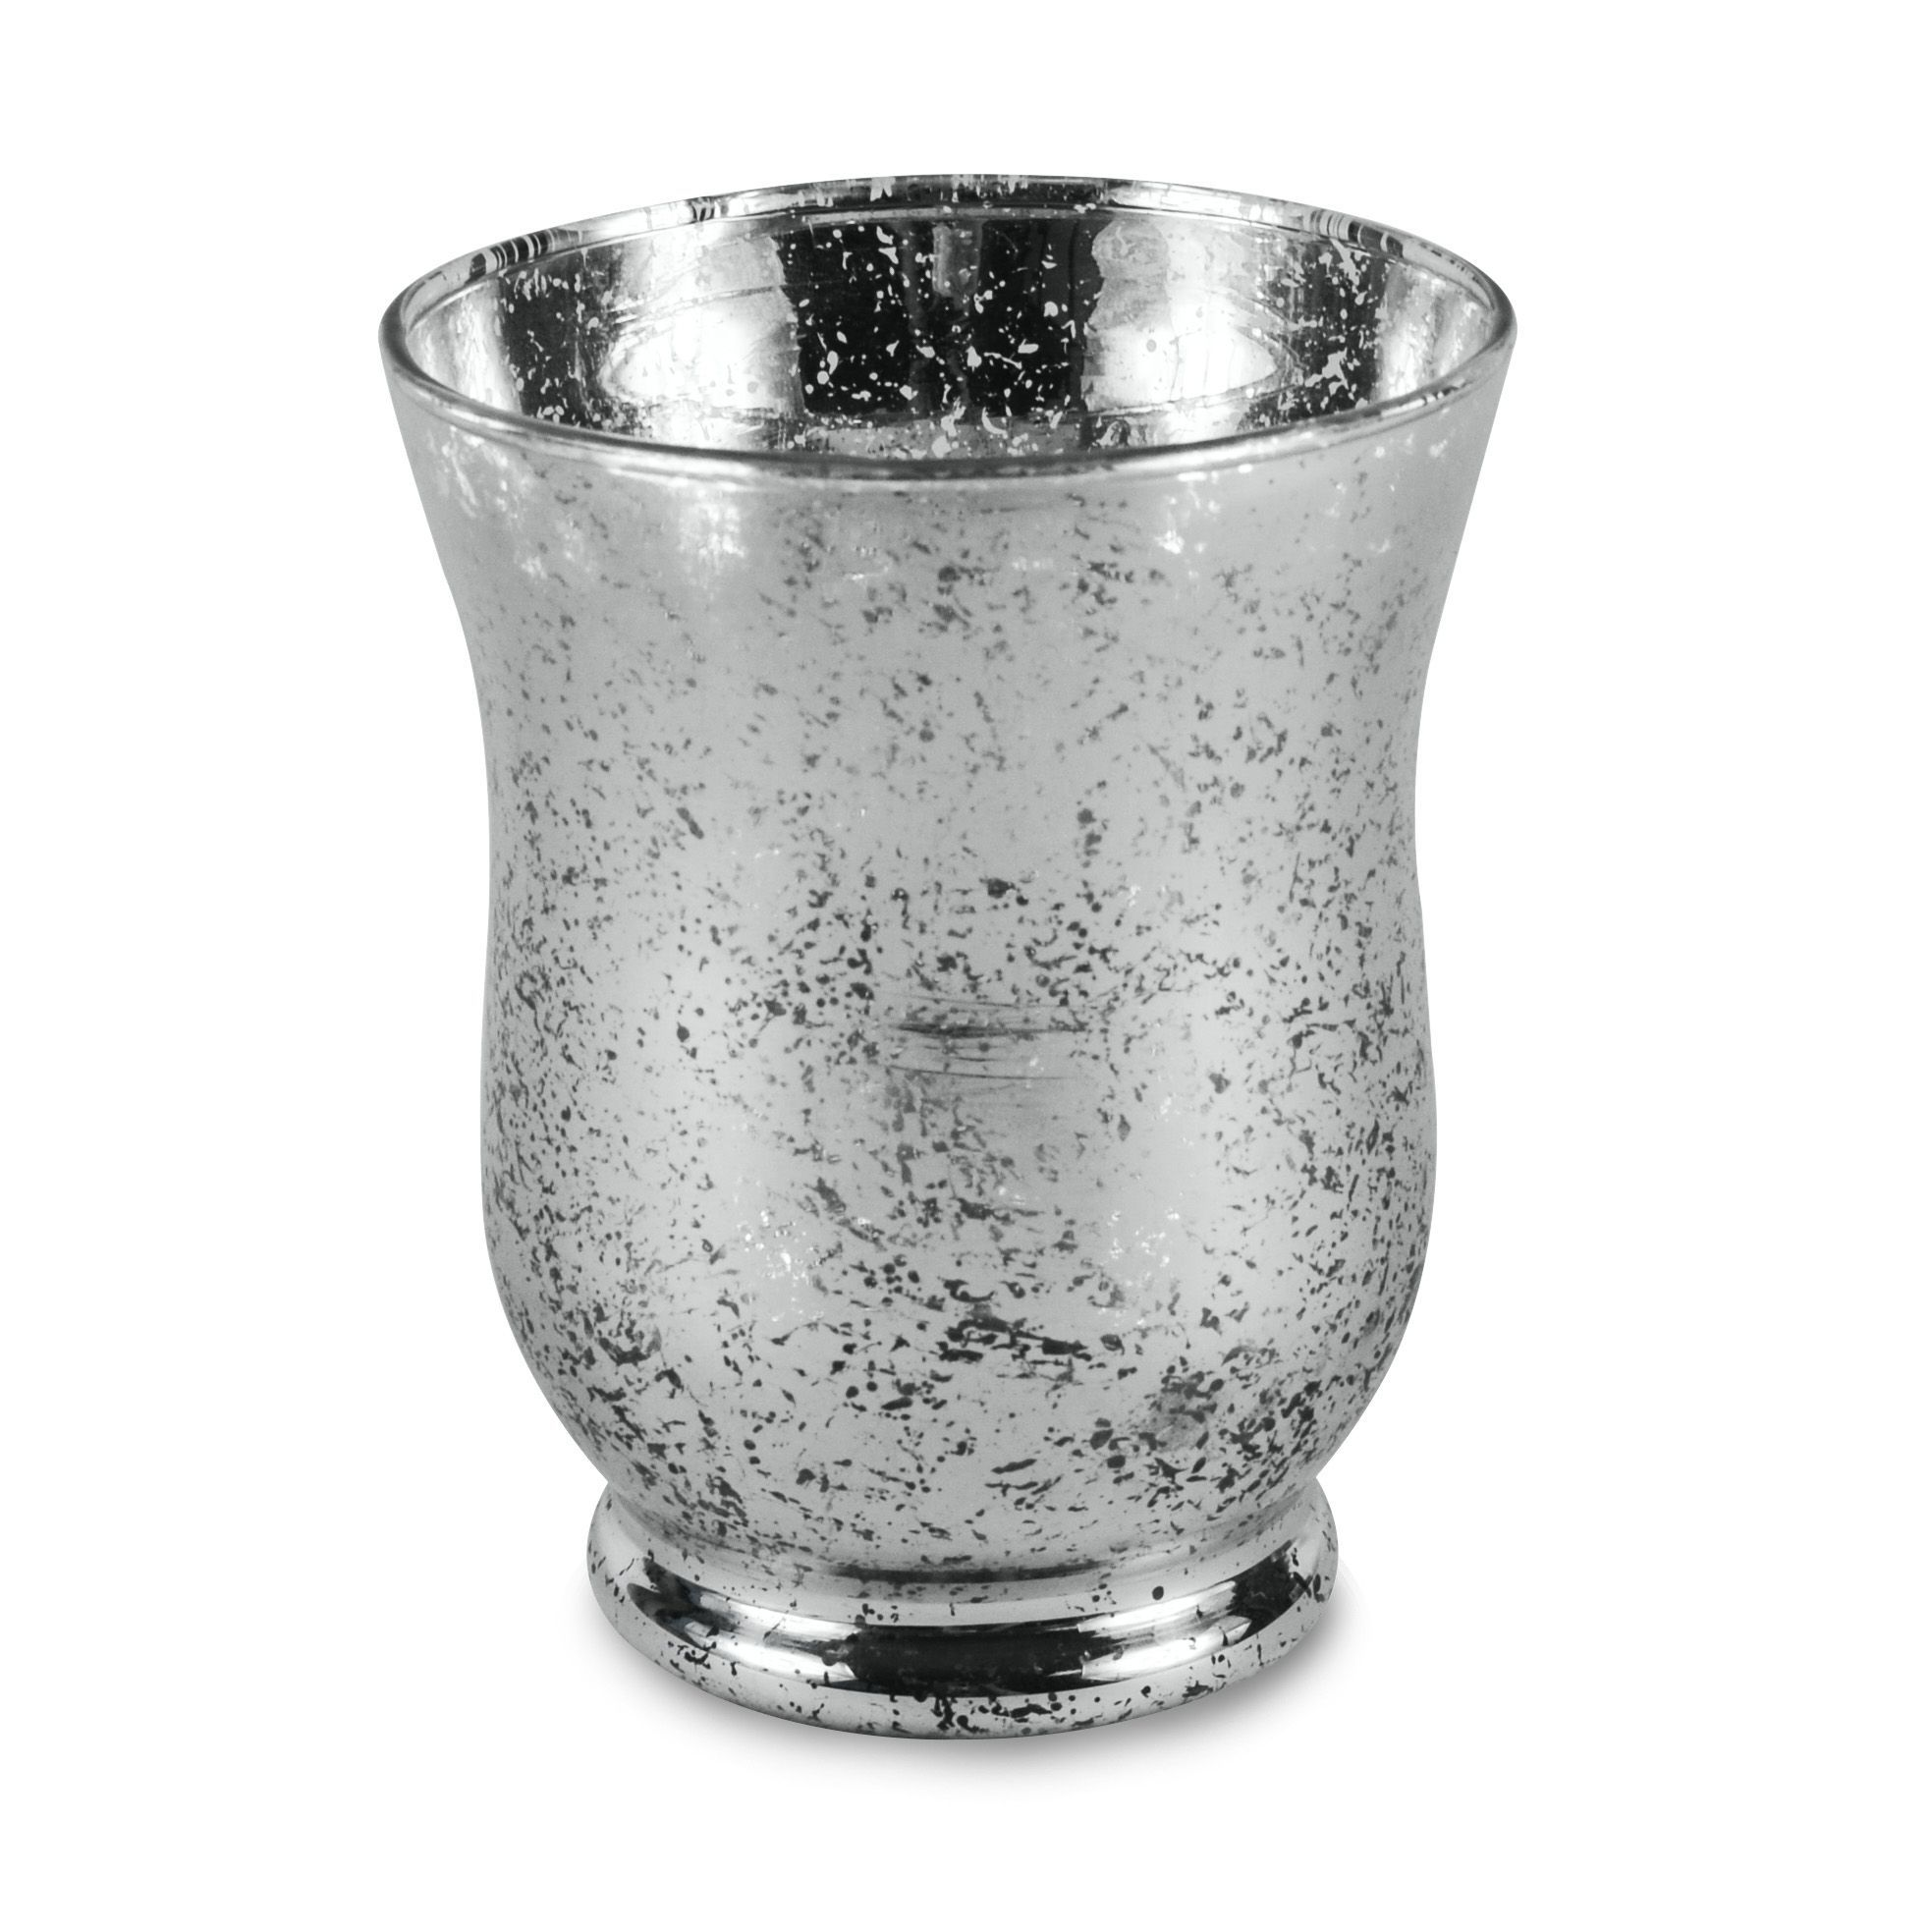 2 inspirational hurricane vase home idea silver silver effect heritage glass hurricane vase small reviewsmspy